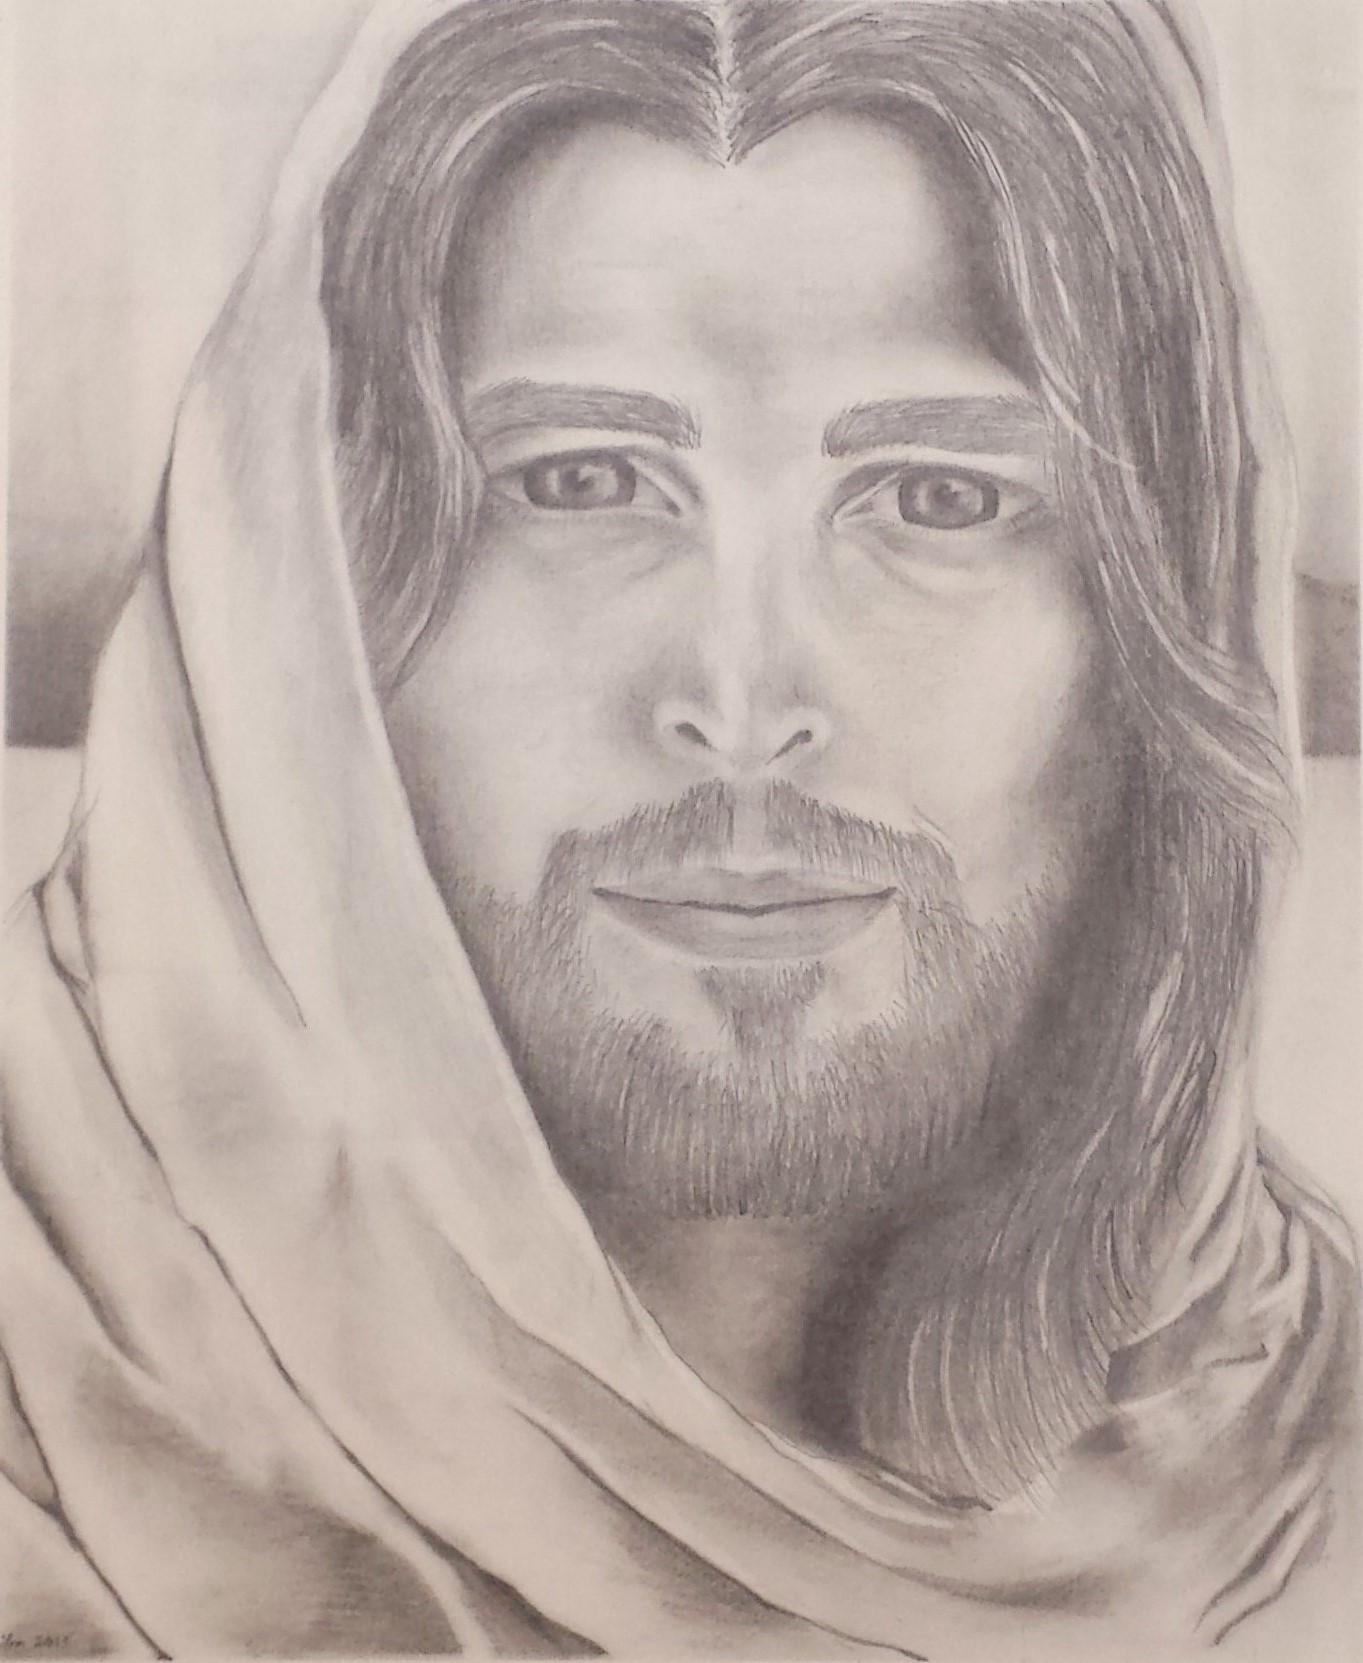 Adult Jesus portrait (Diogo Morgado) by DC-Art-Therapist